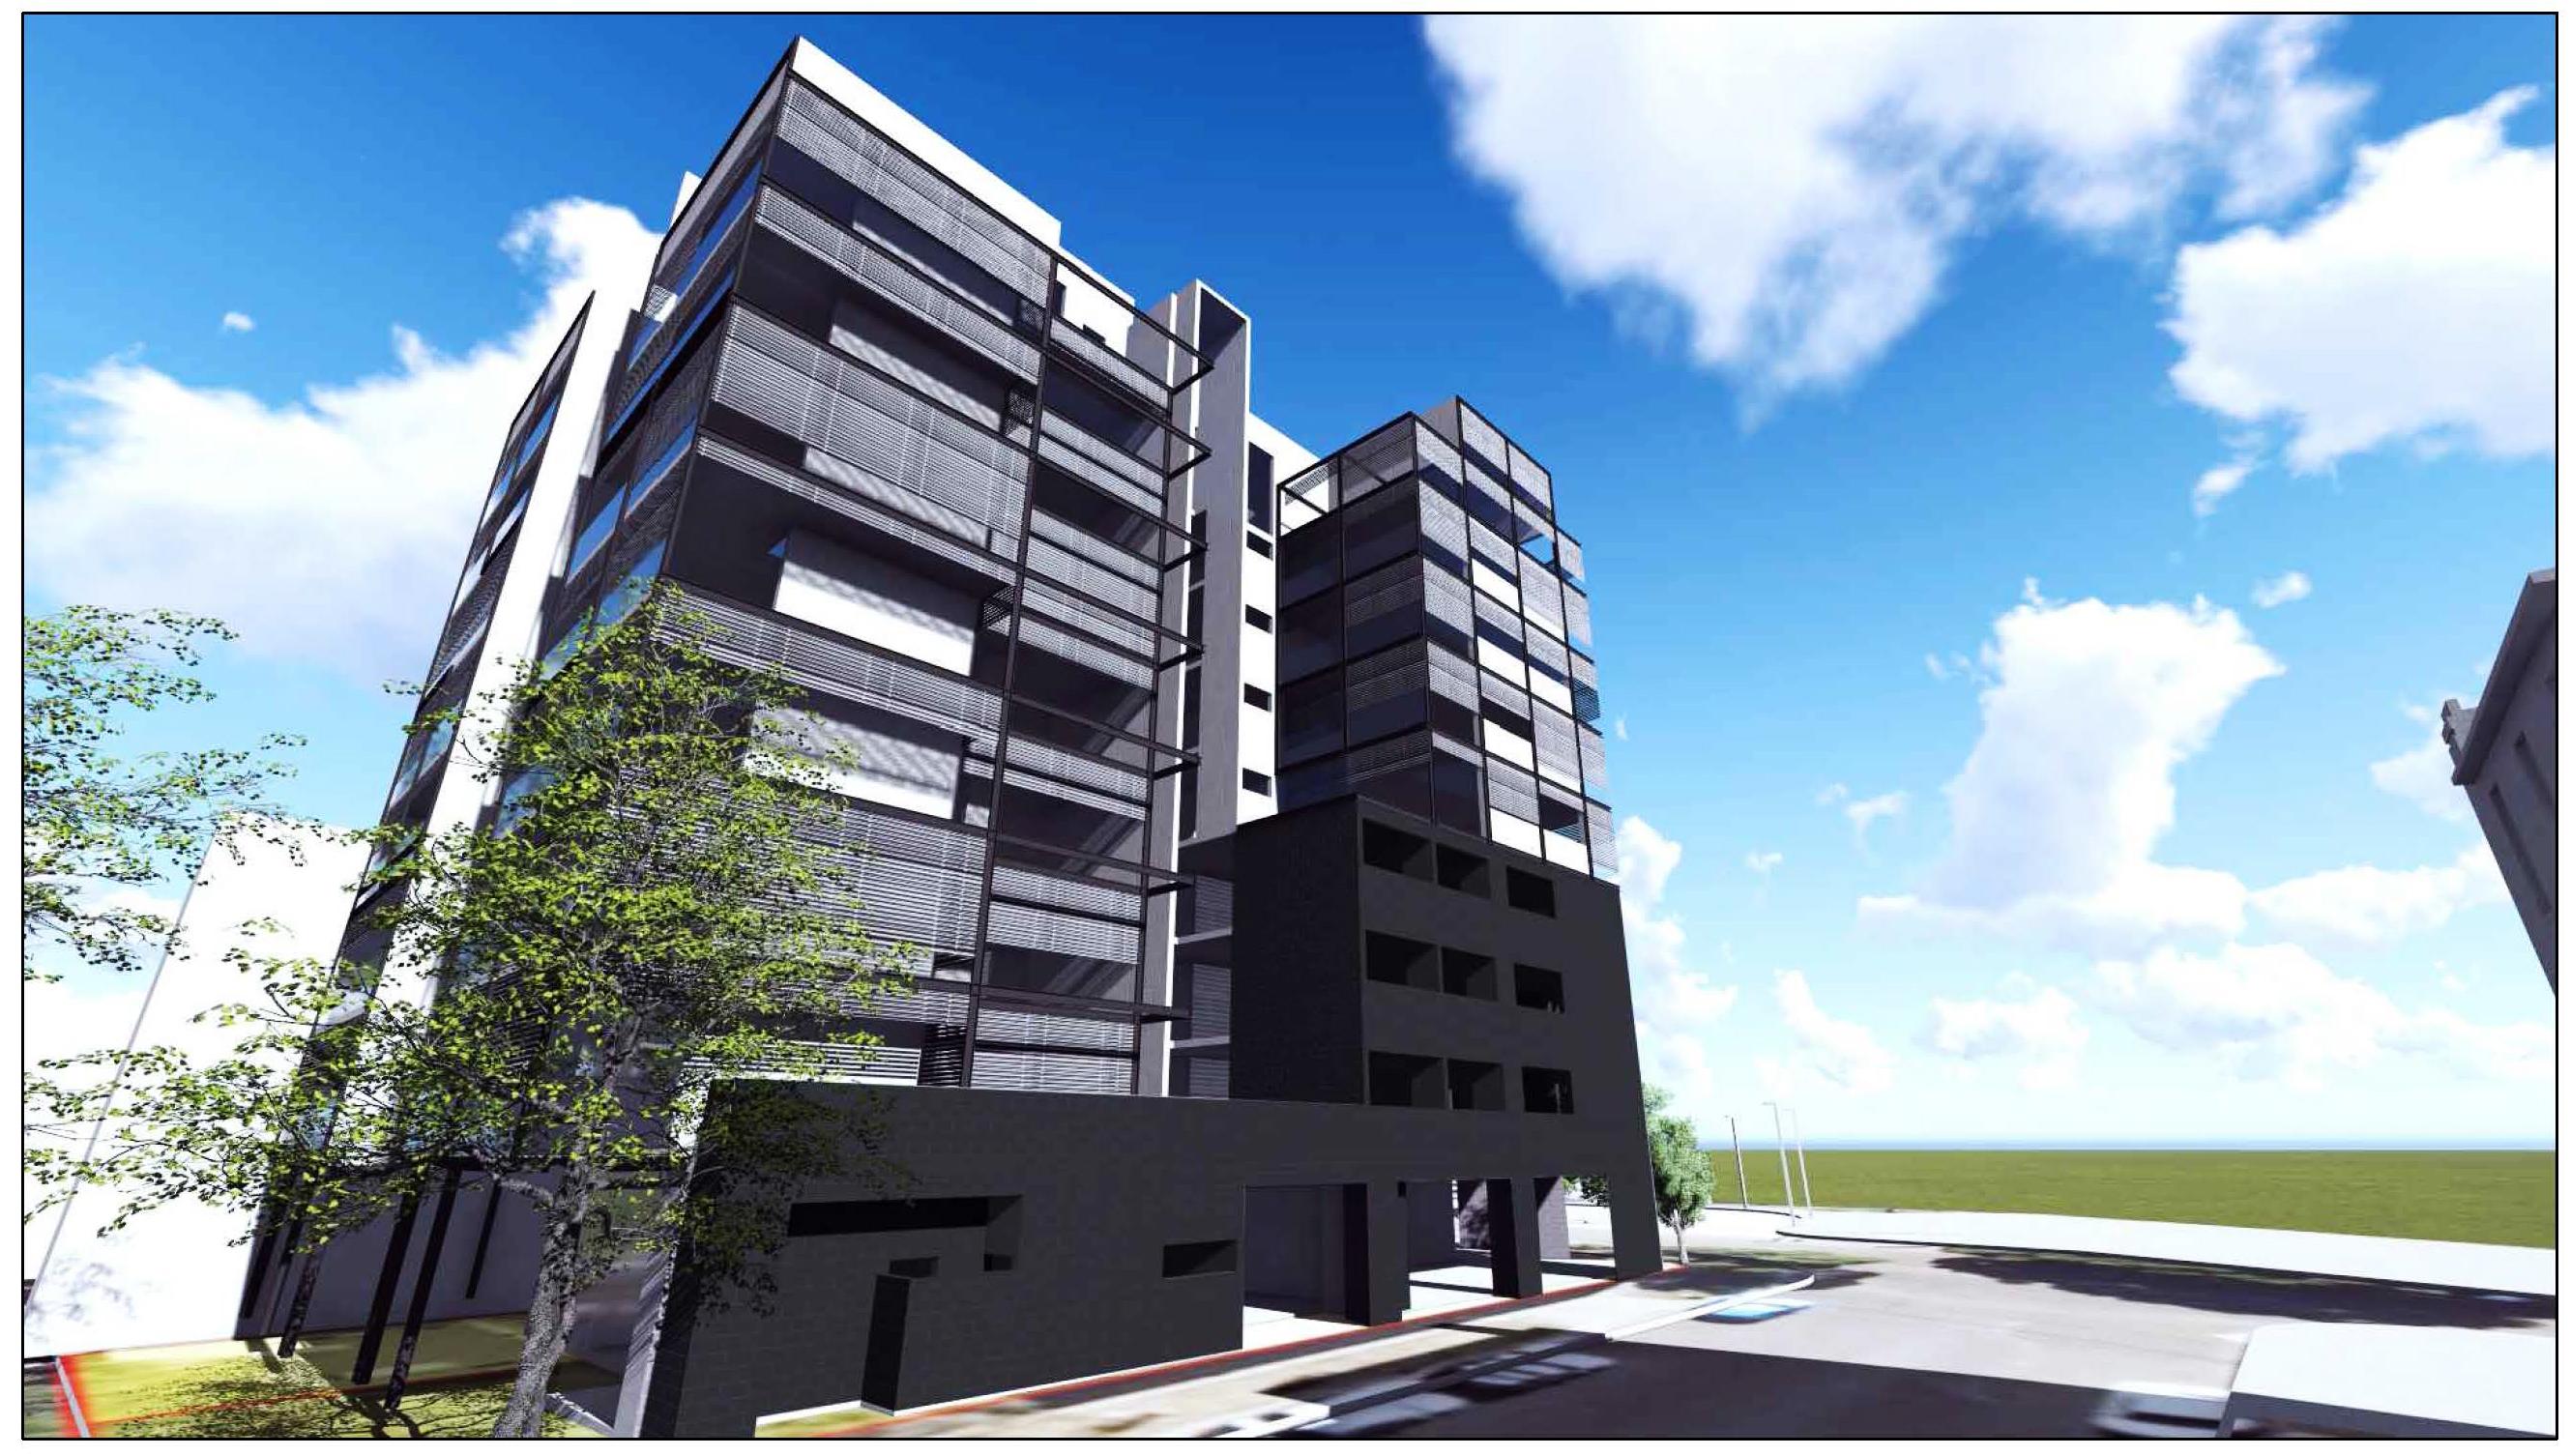 charles_tang_design_apartment_and_retail_mixed_use-sutherland 3